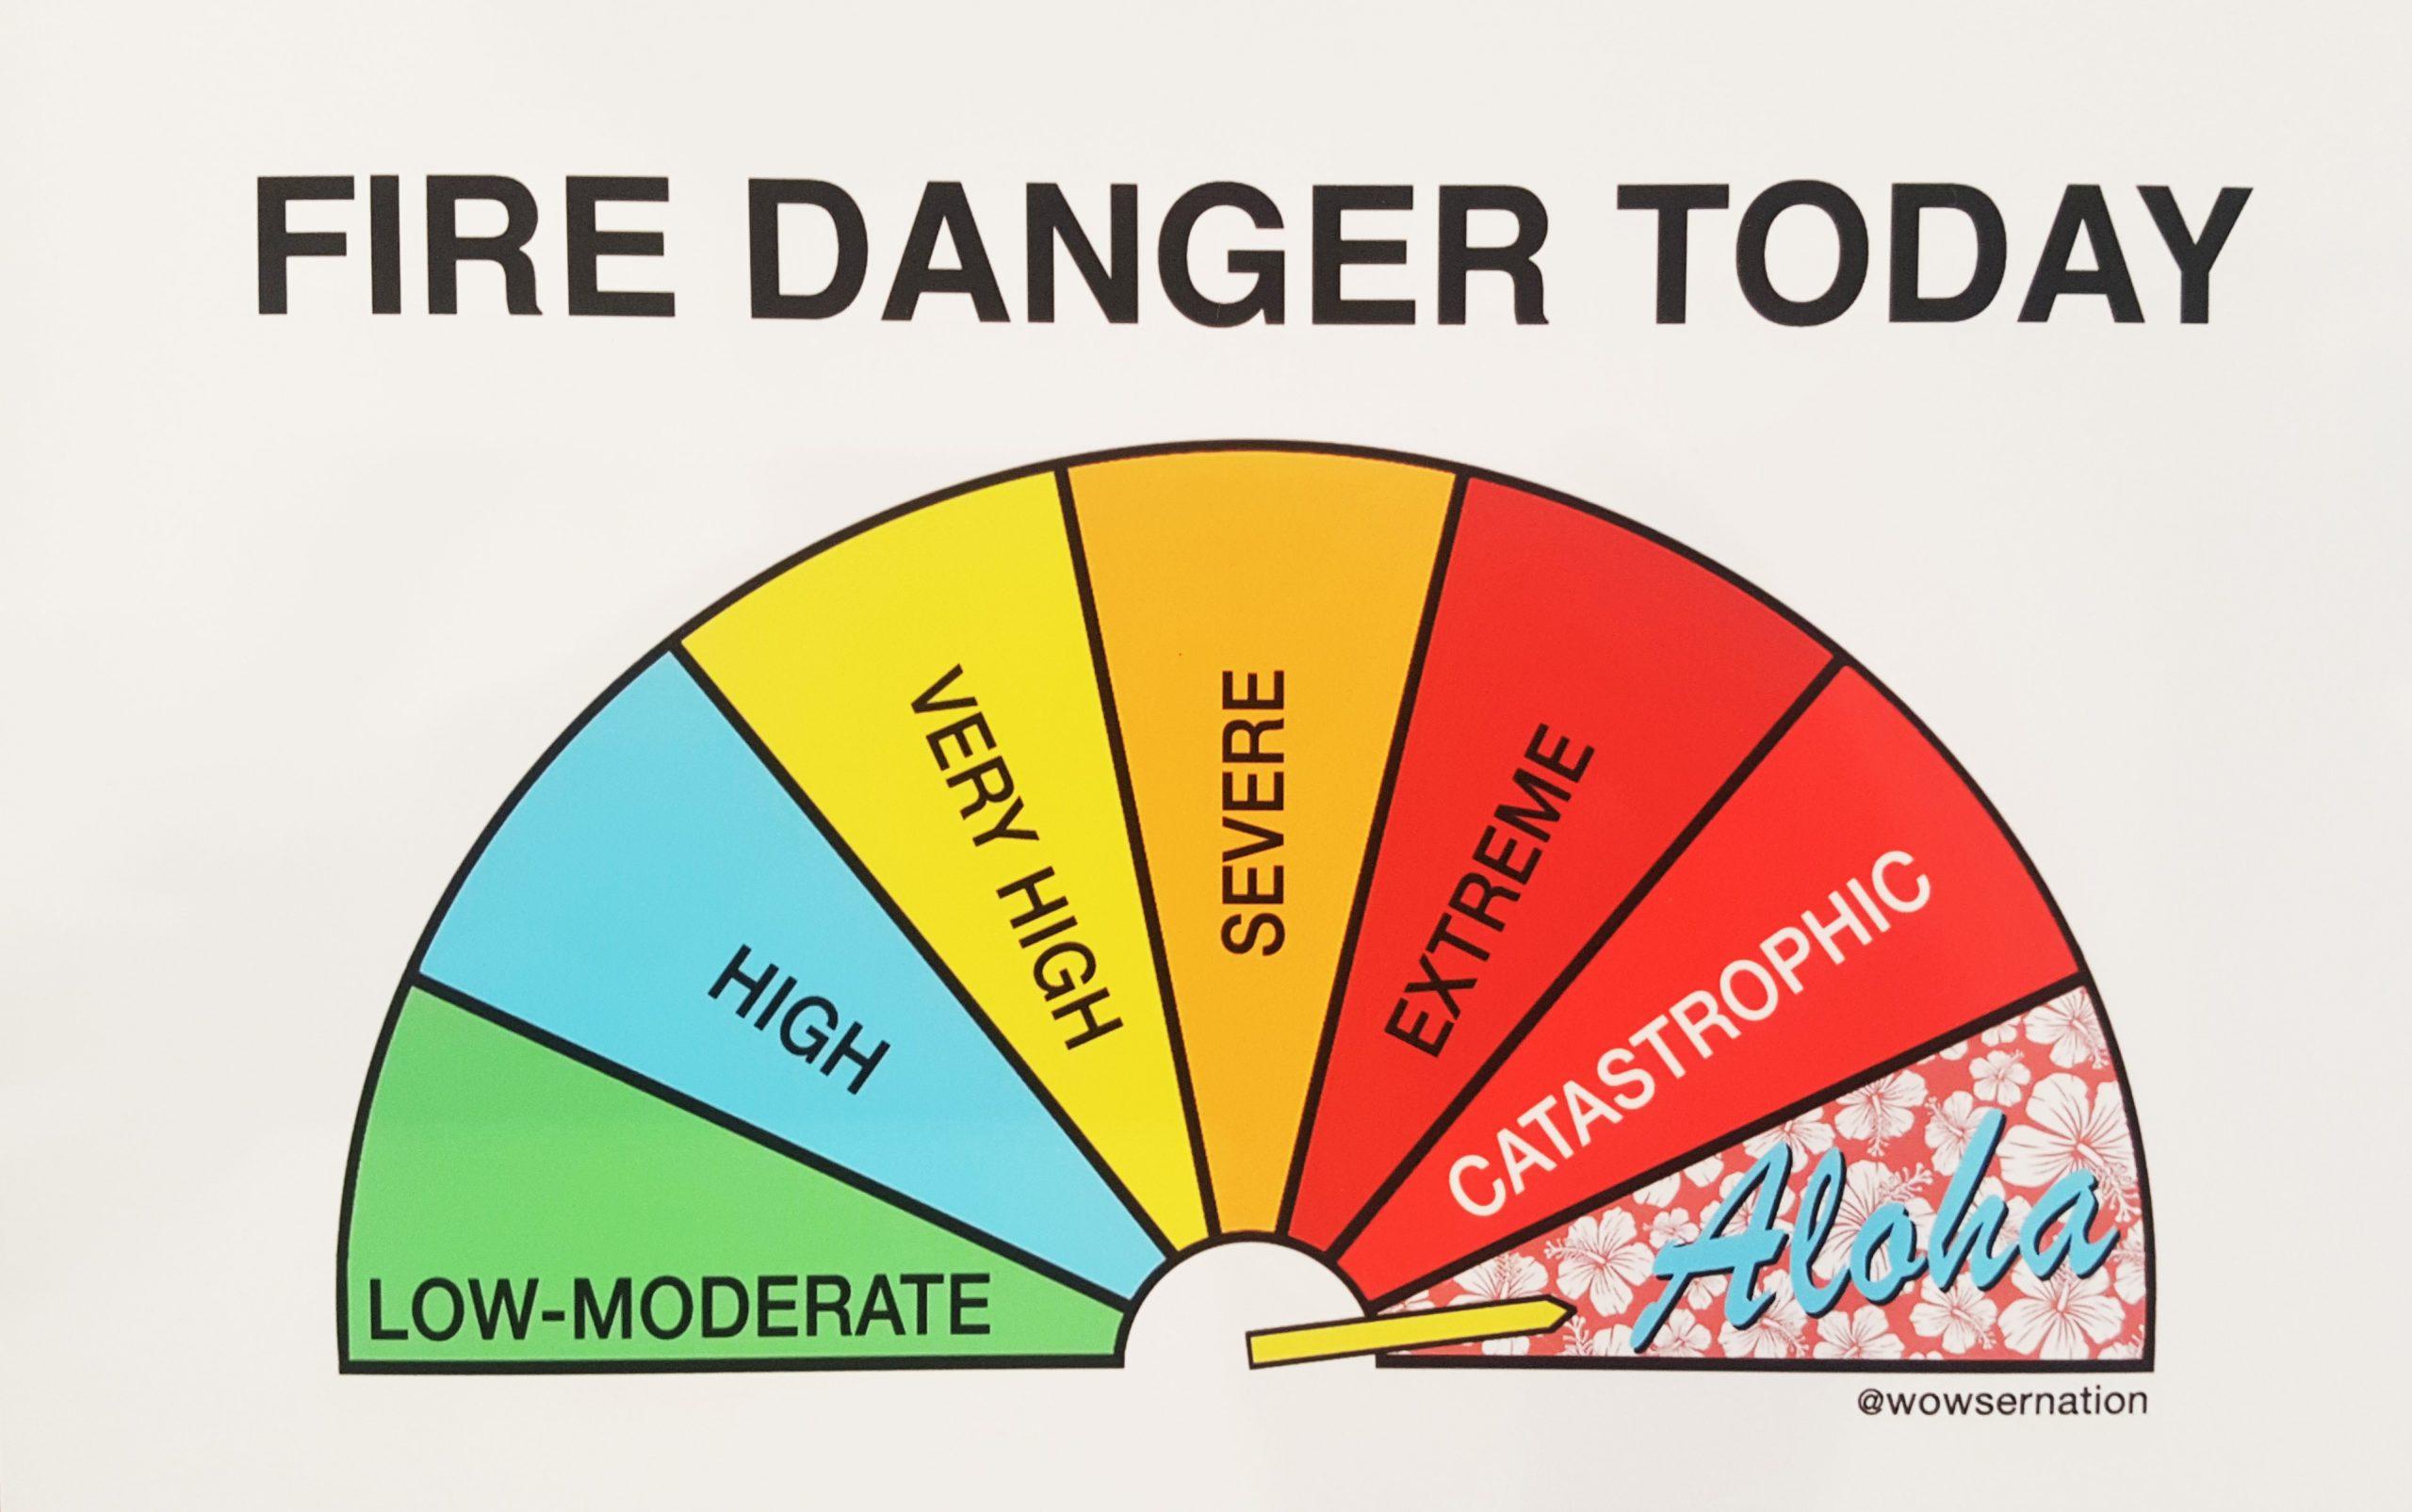 Fire danger today